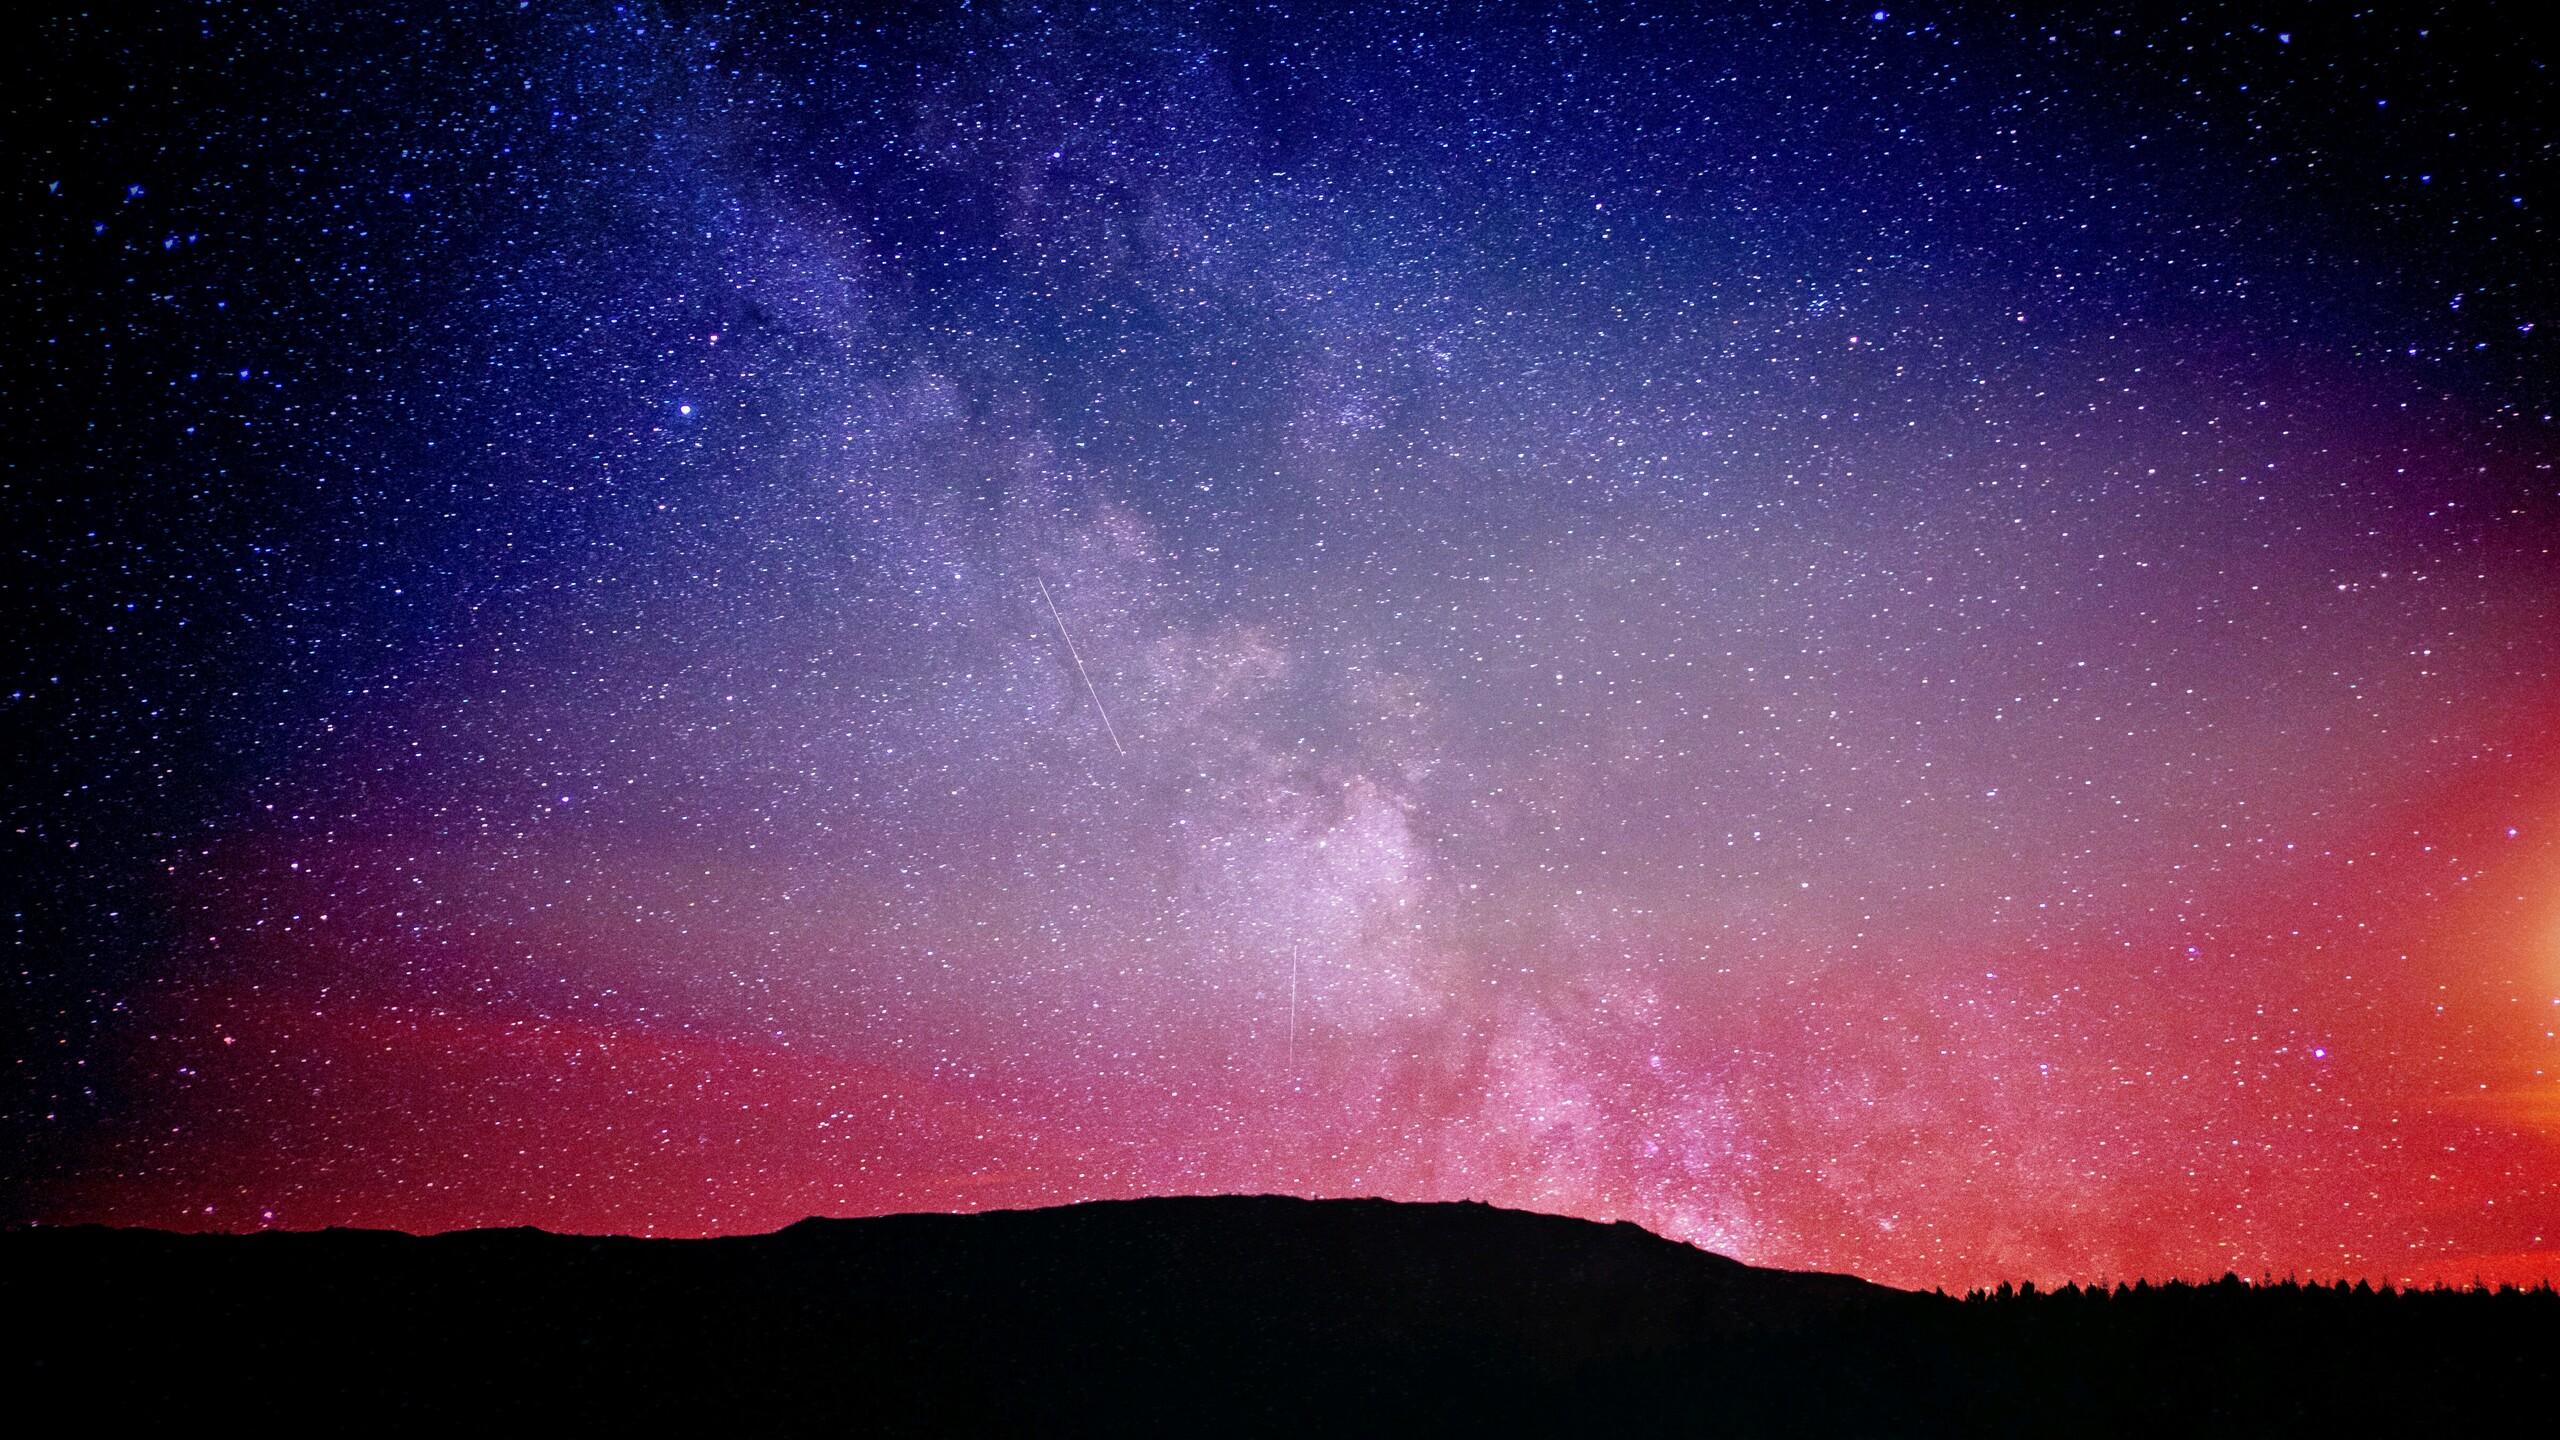 2560x1440 Night Sky Constellations 4k 1440p Resolution Hd 4k